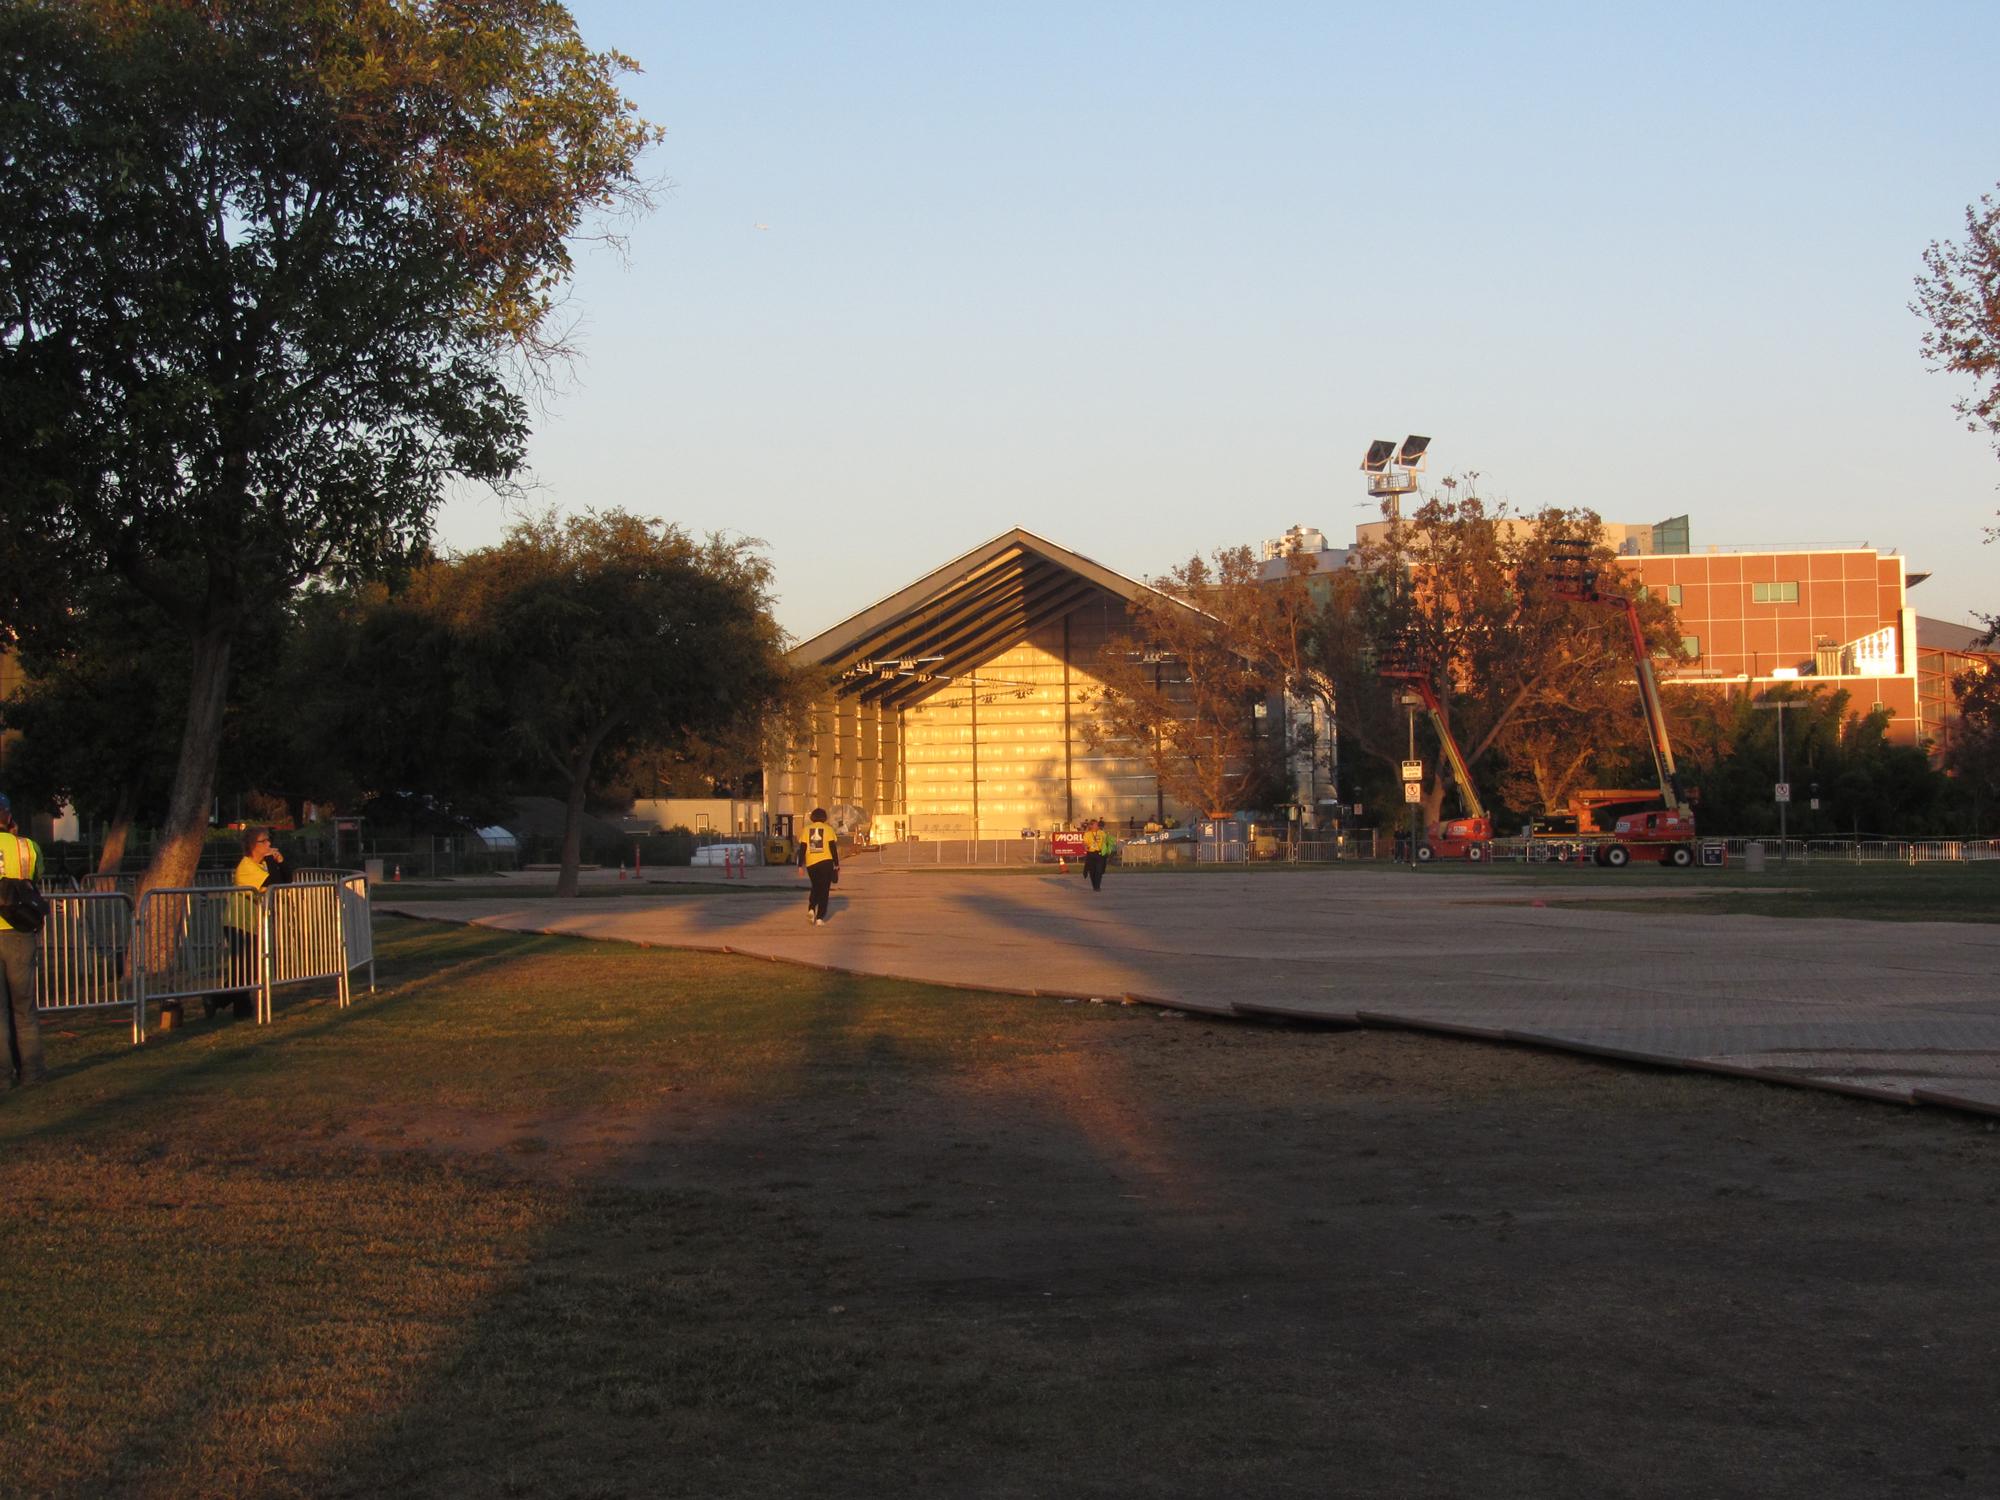 Shuttle Endeavour's Museum Hangar